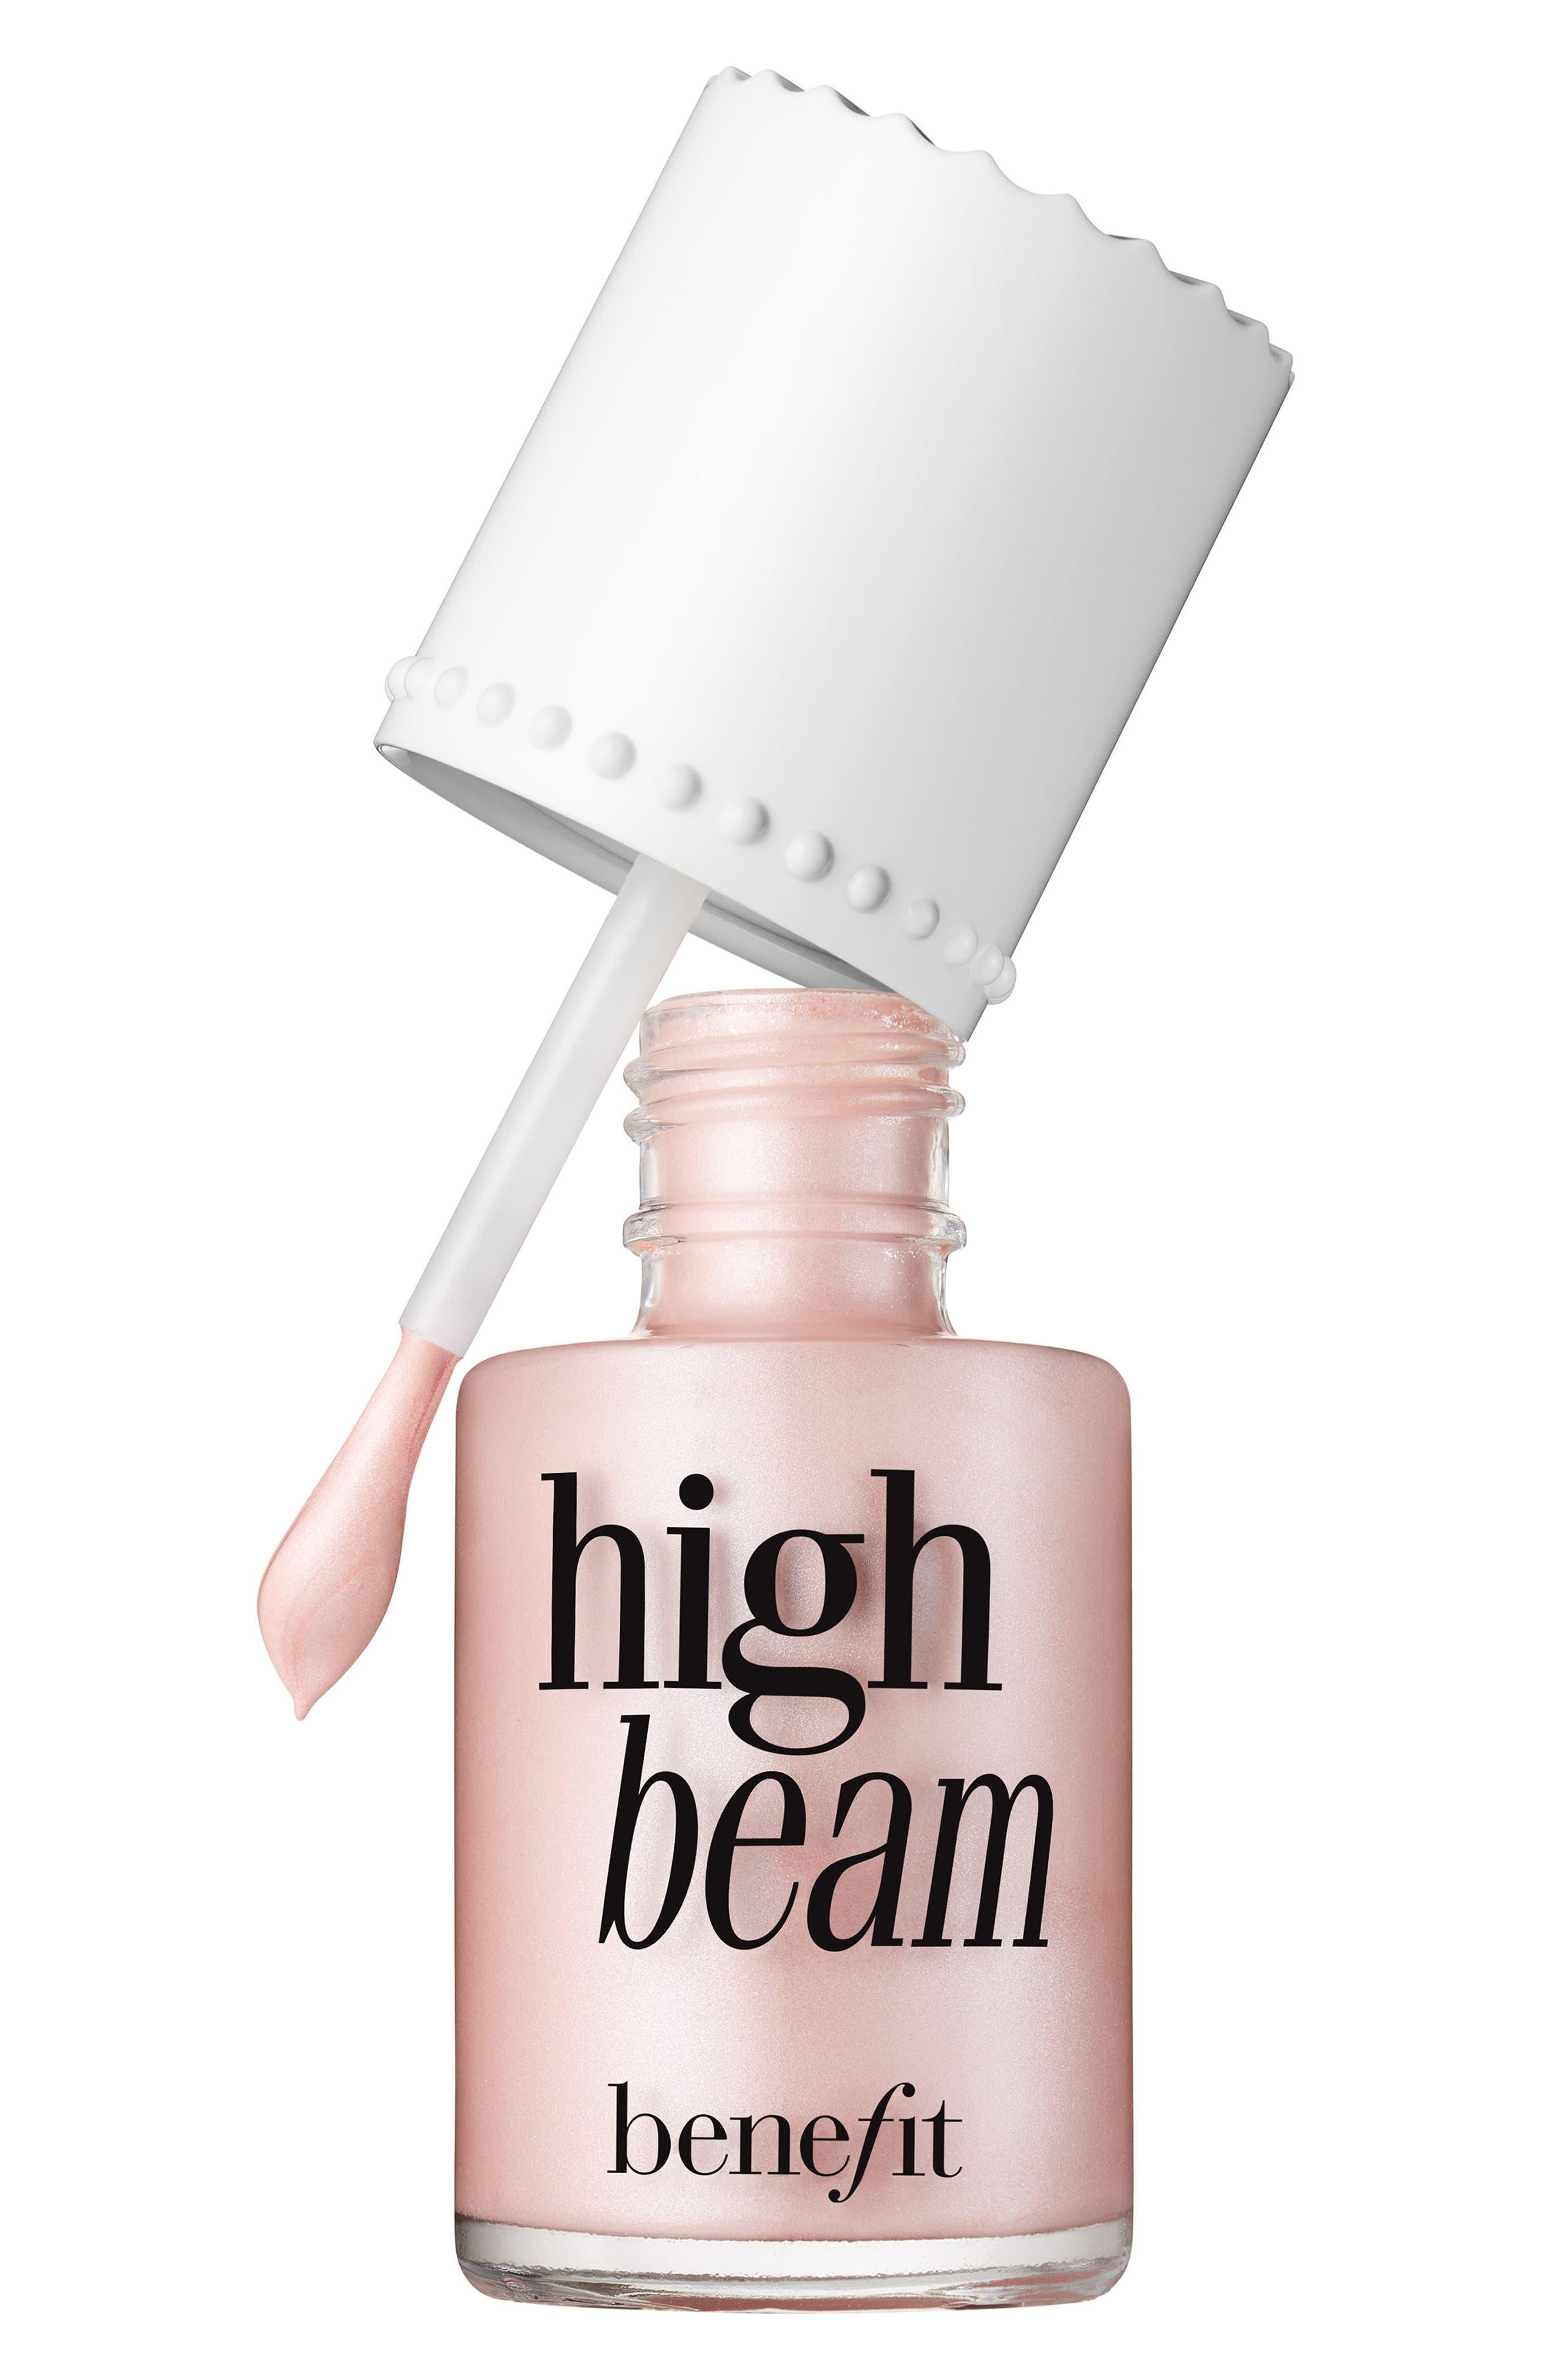 Benefit High Beam Satiny Pink Liquid Highlighter,                             Main thumbnail 1, color,                             PINK